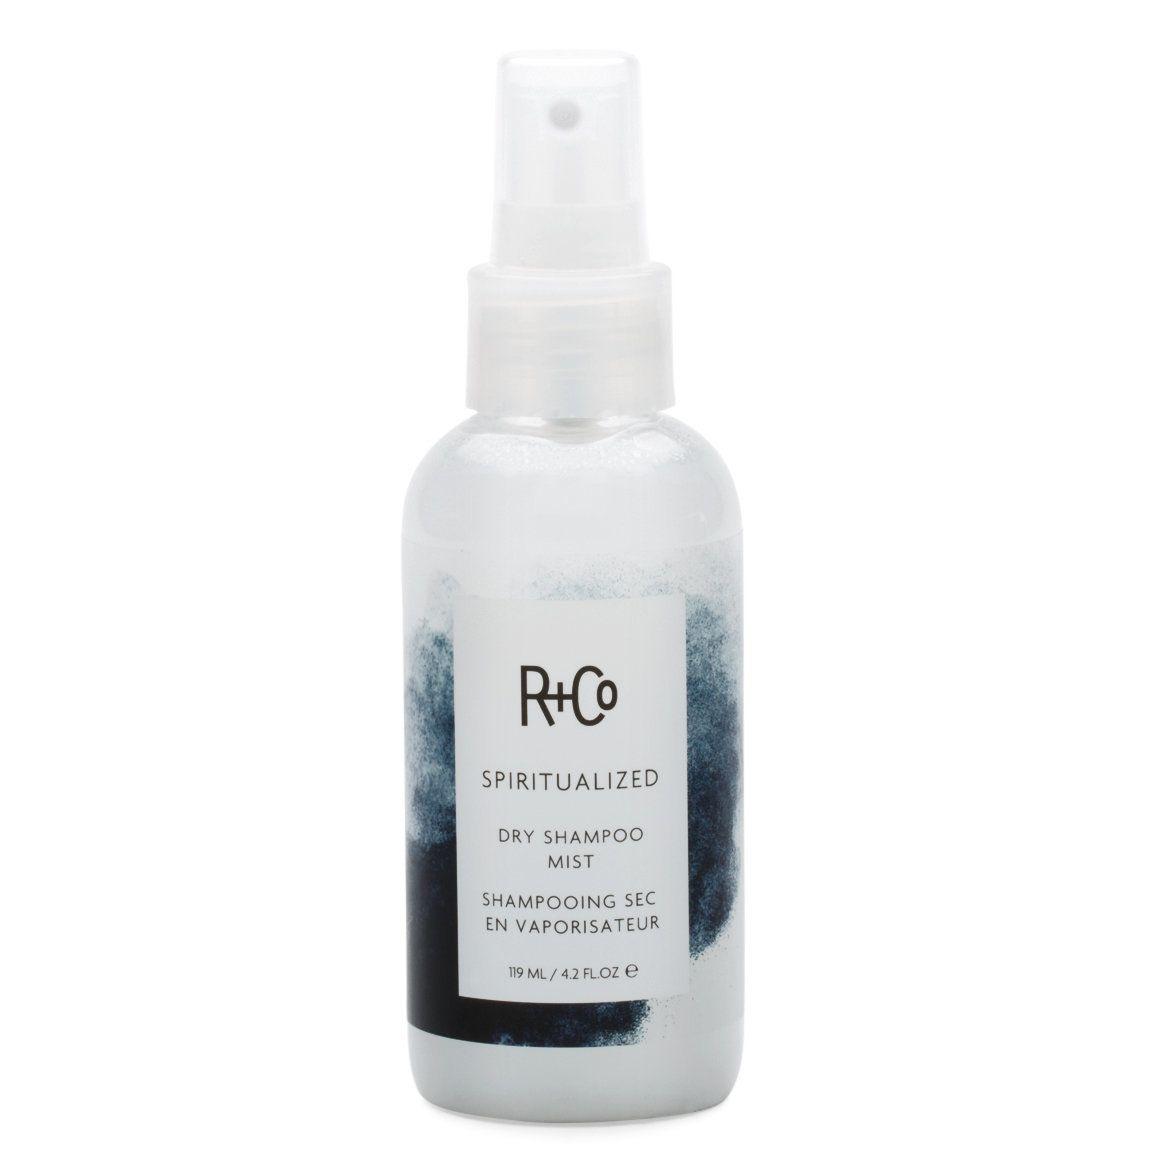 Spiritualized Dry Shampoo Mist in hair Pinterest Dry